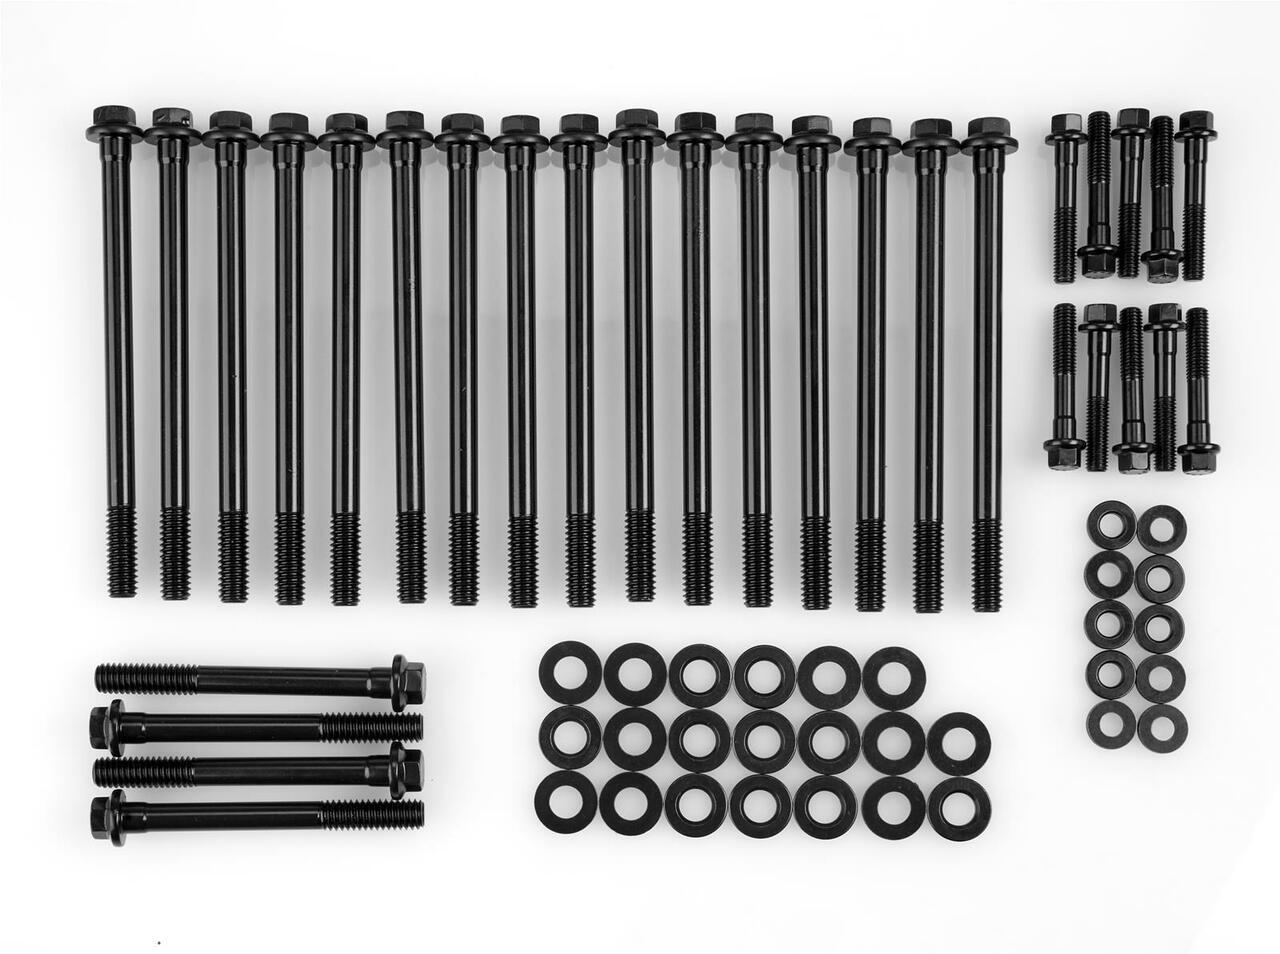 ARP 134-3609 Fits 1997-2003 Cylinder Head Bolt Kits 4.8 5.3 5.7 6.0 6.2 LS1 LS2 LS3Pro Series High Performance